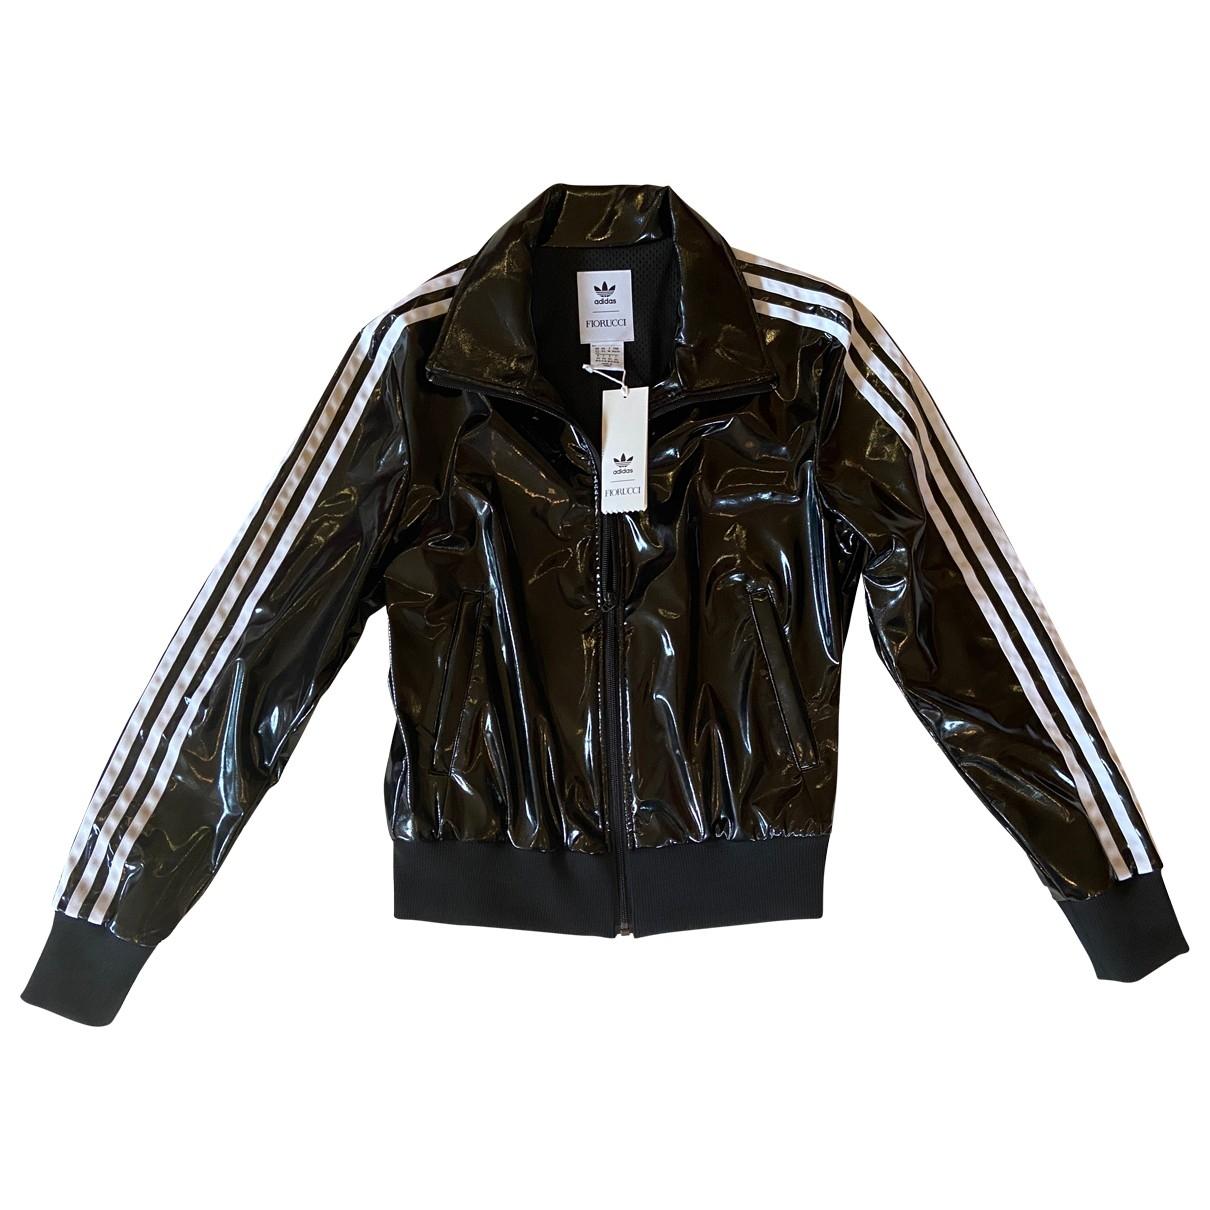 Adidas \N Black jacket for Women XS International